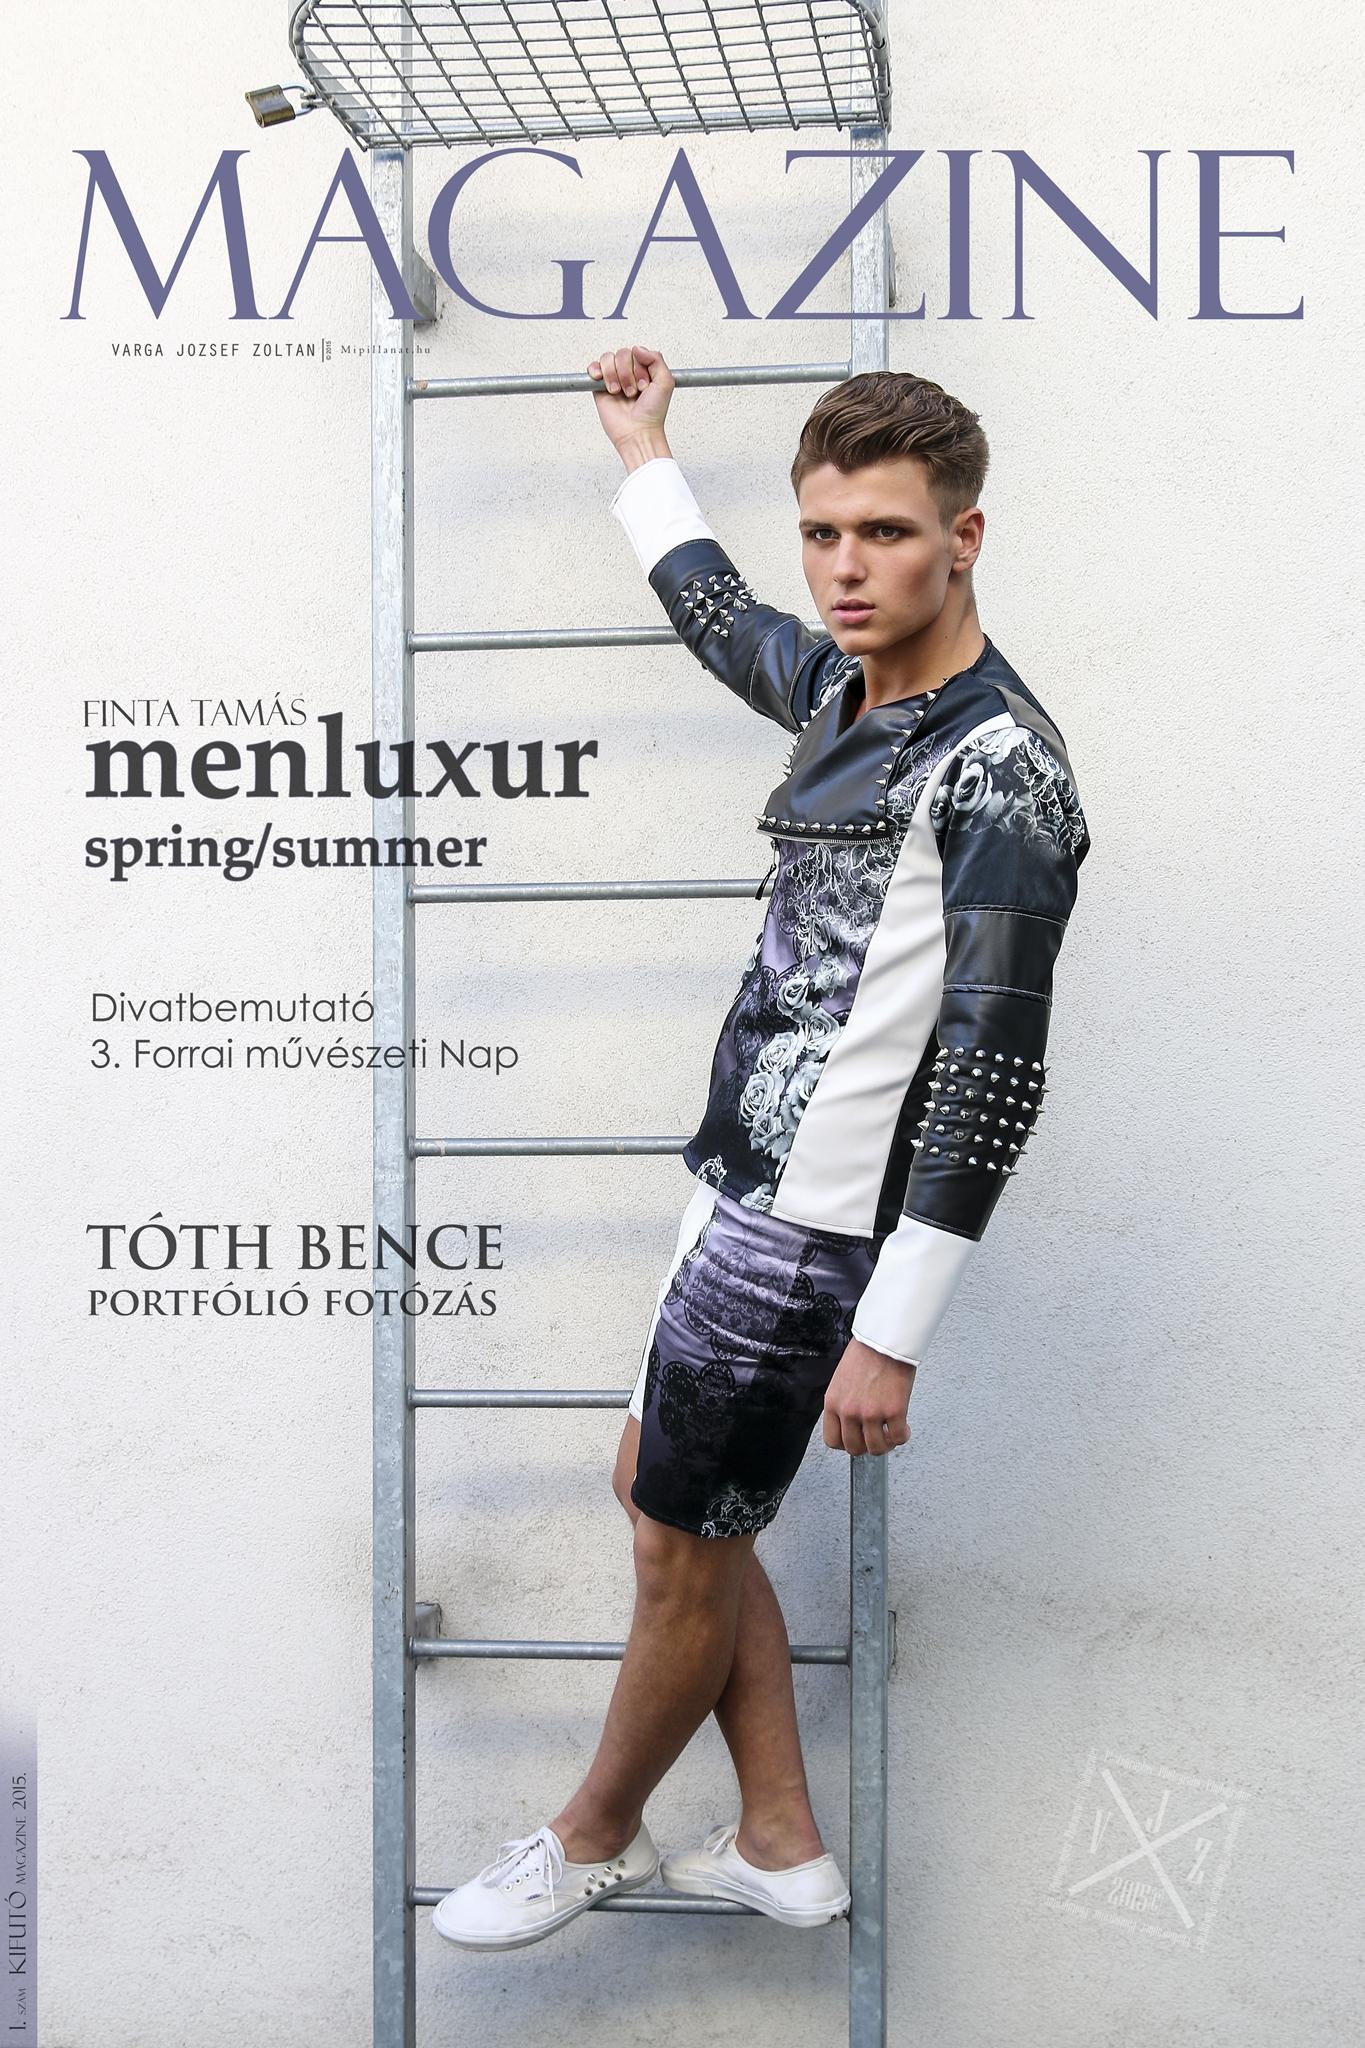 Magazine 2015 05   Finta Tamás   Fashion designer